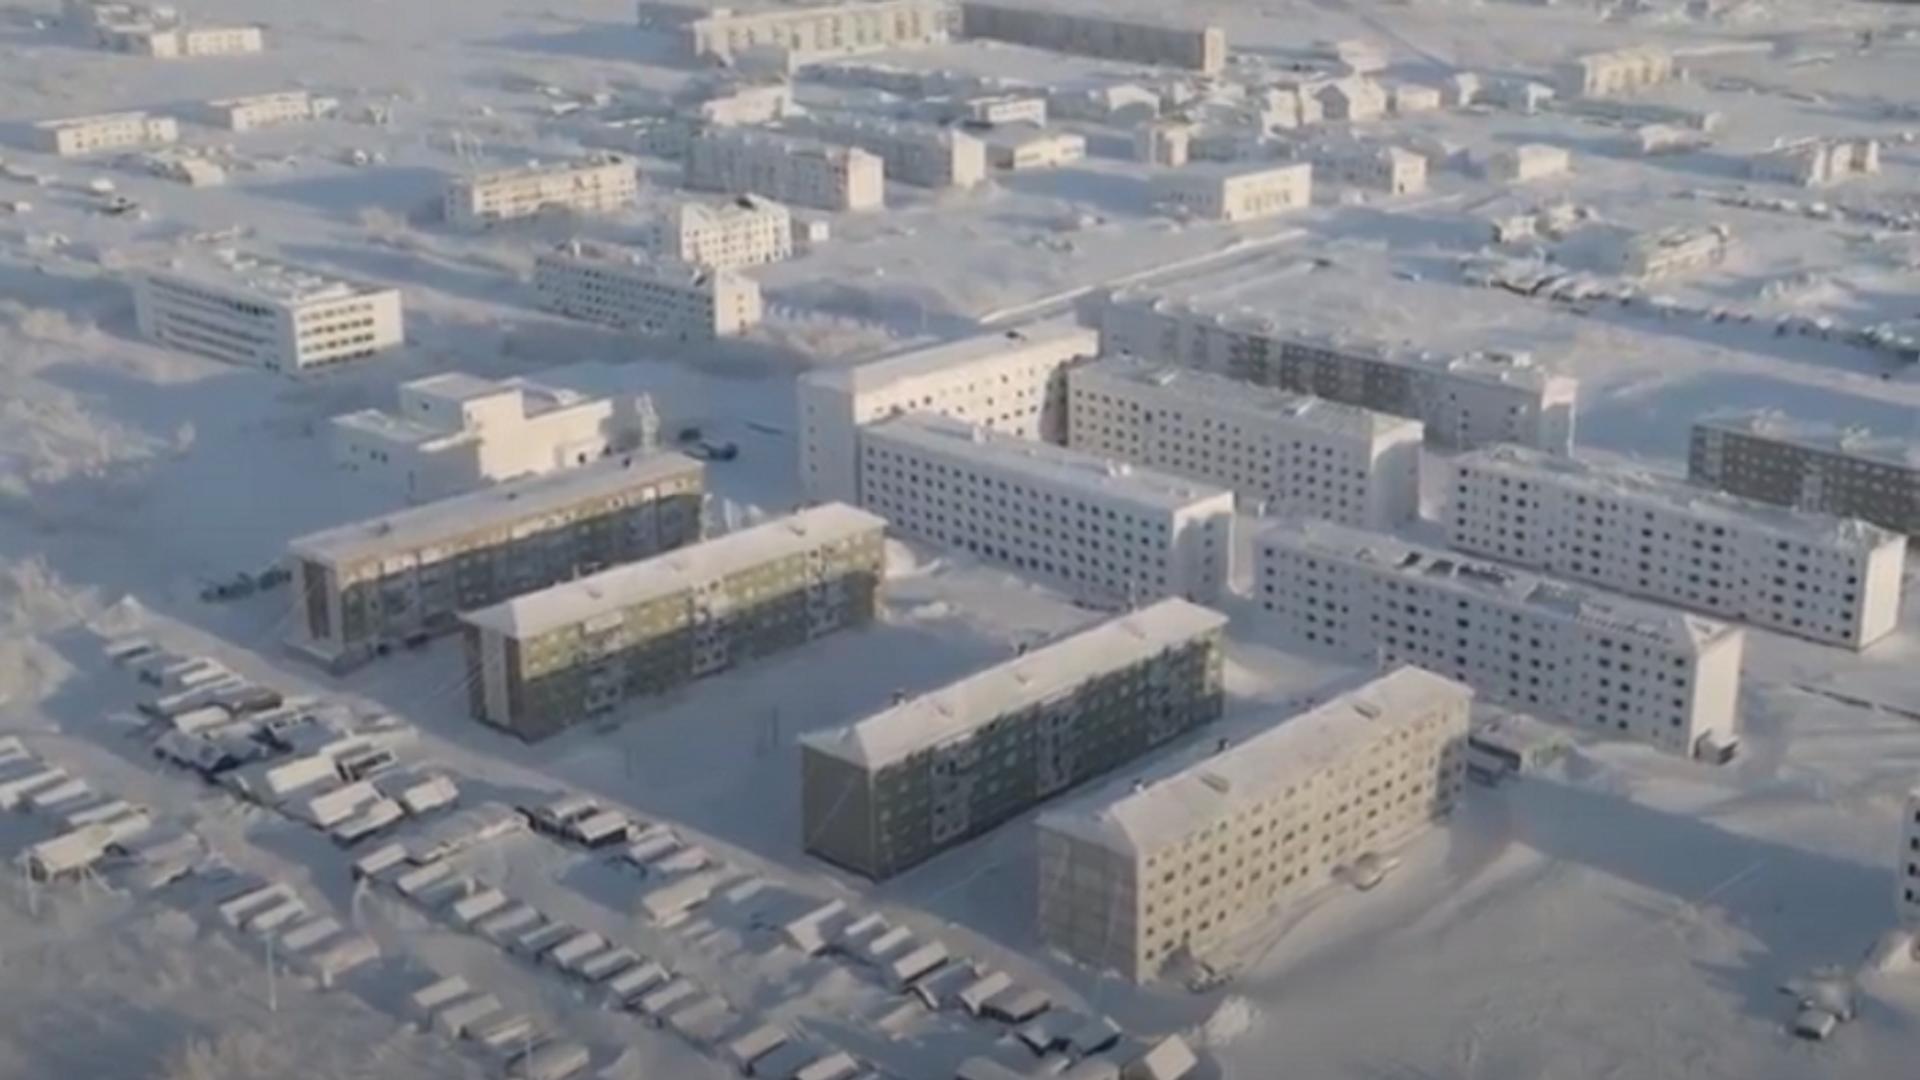 Ciudad rusa de Vorkutá - Sputnik Mundo, 1920, 23.02.2021